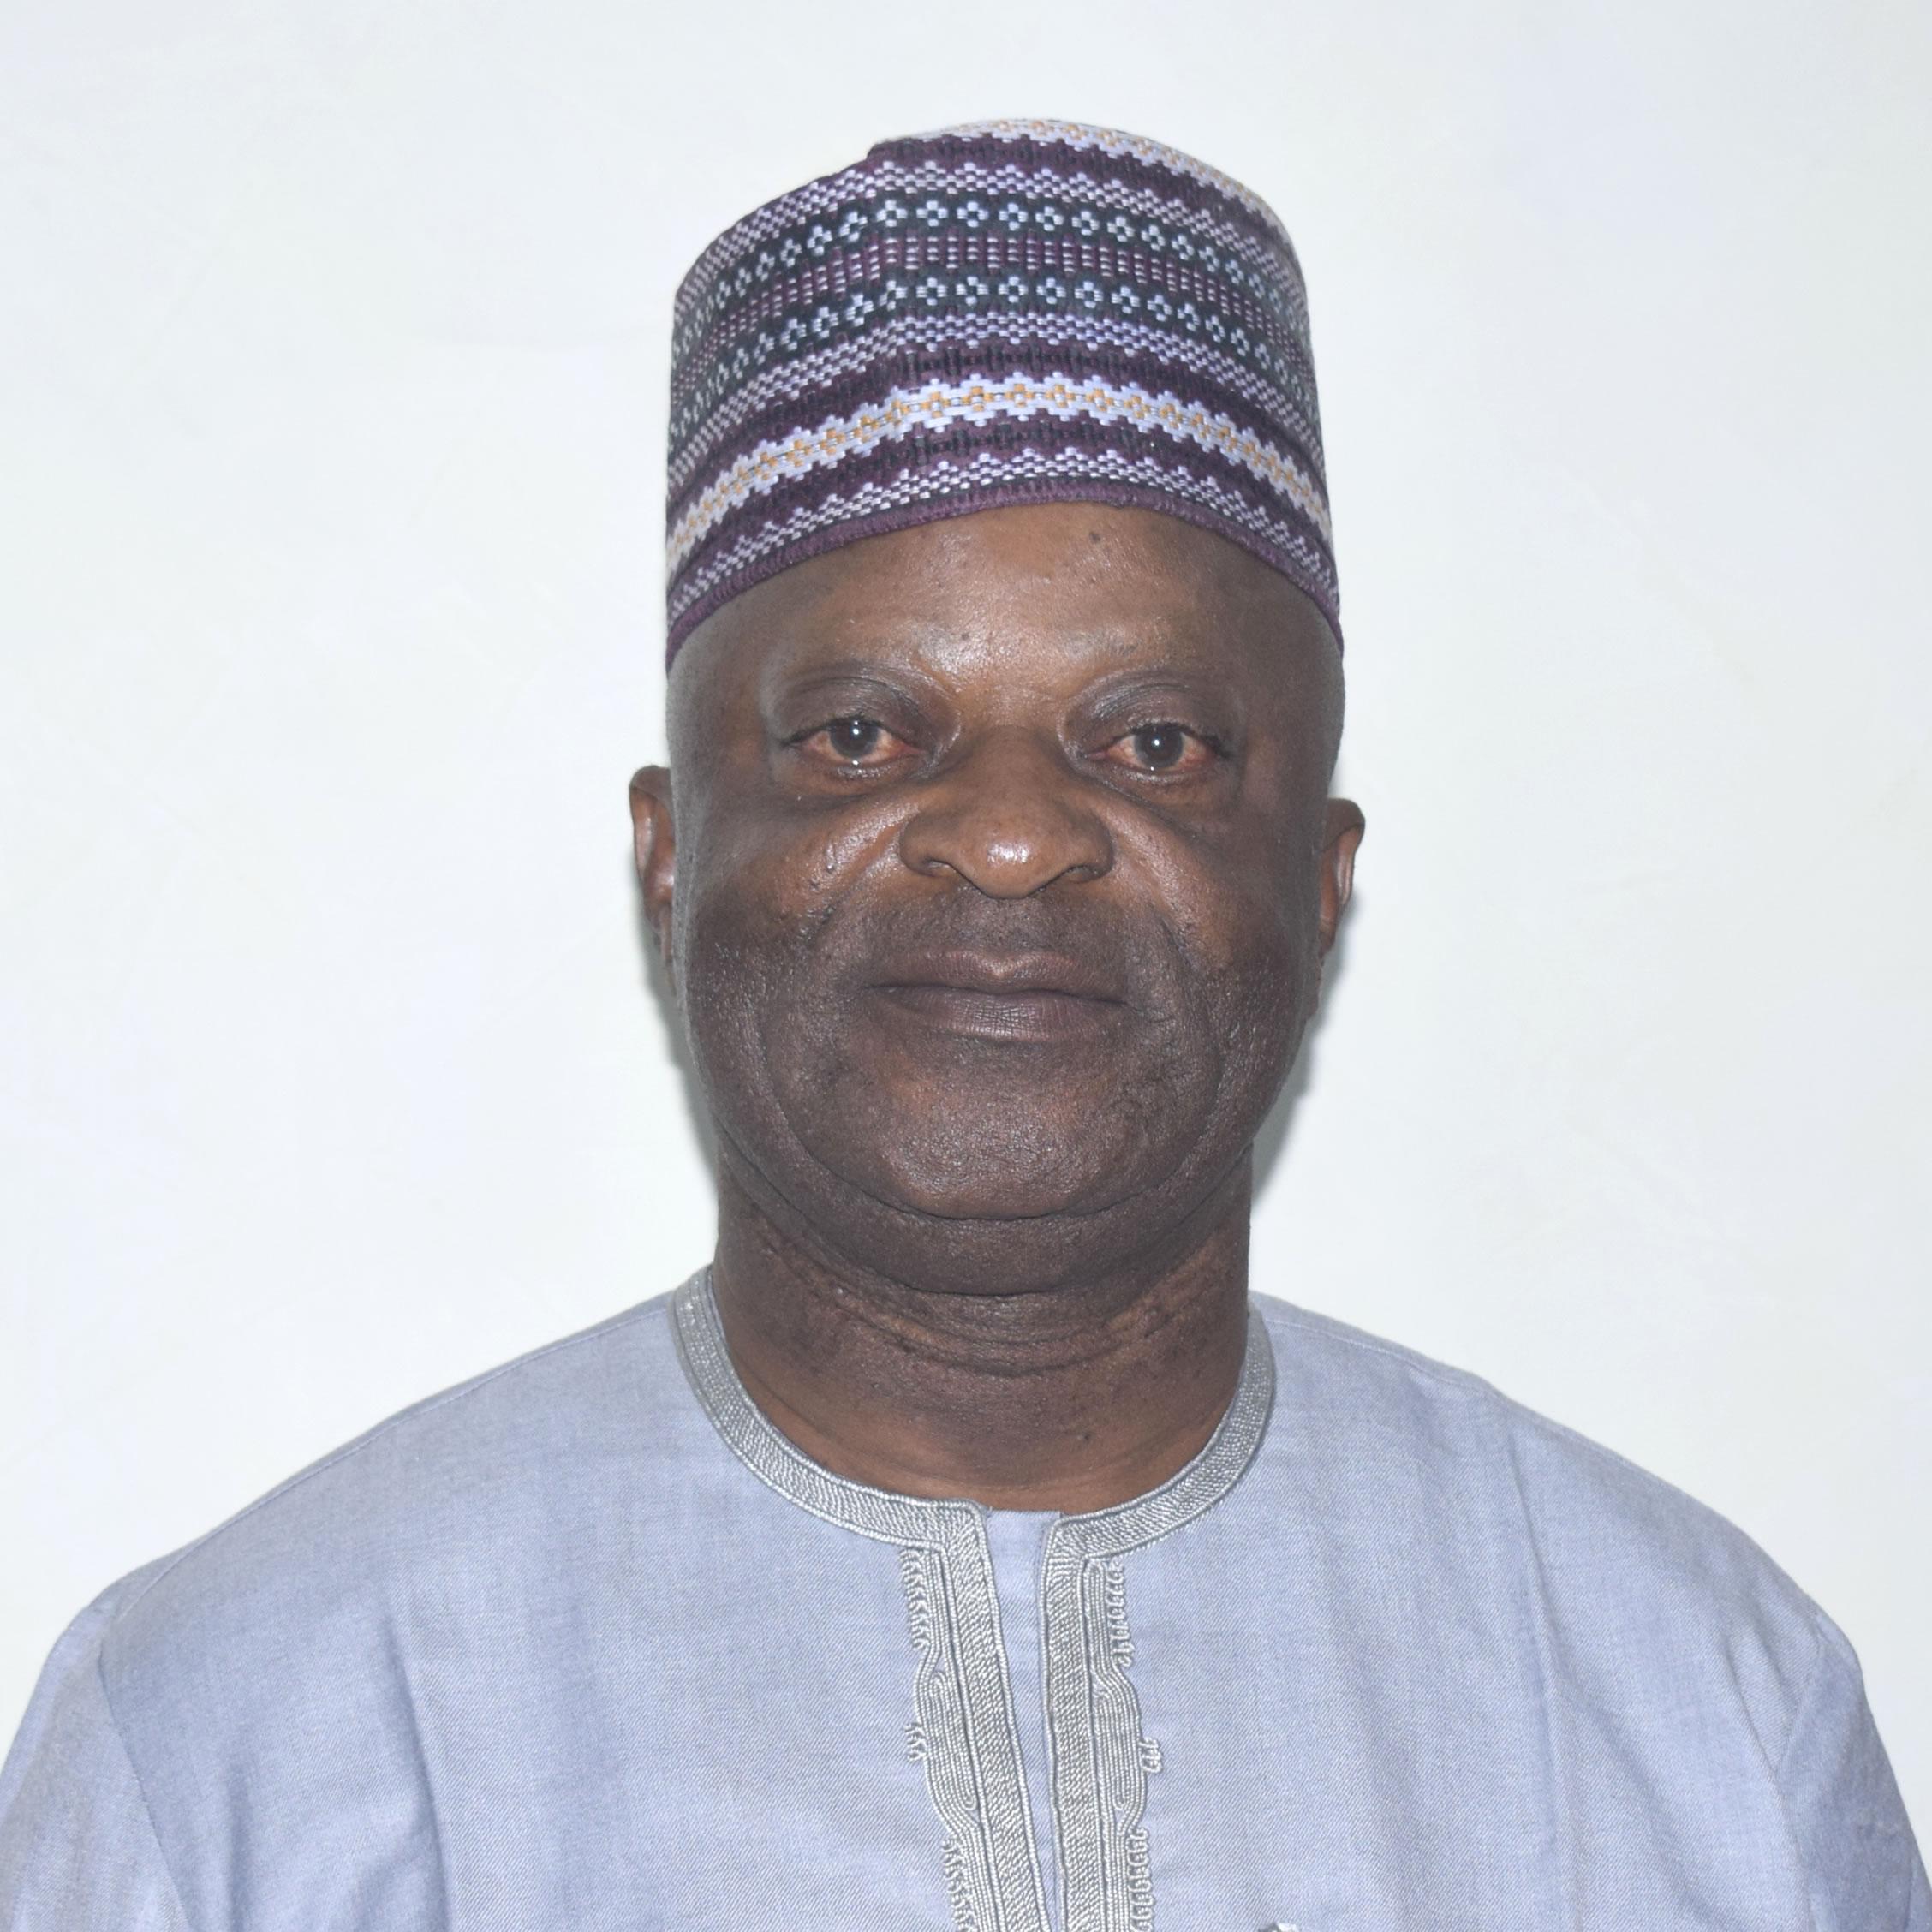 Mr. Ashibel P. Utsu